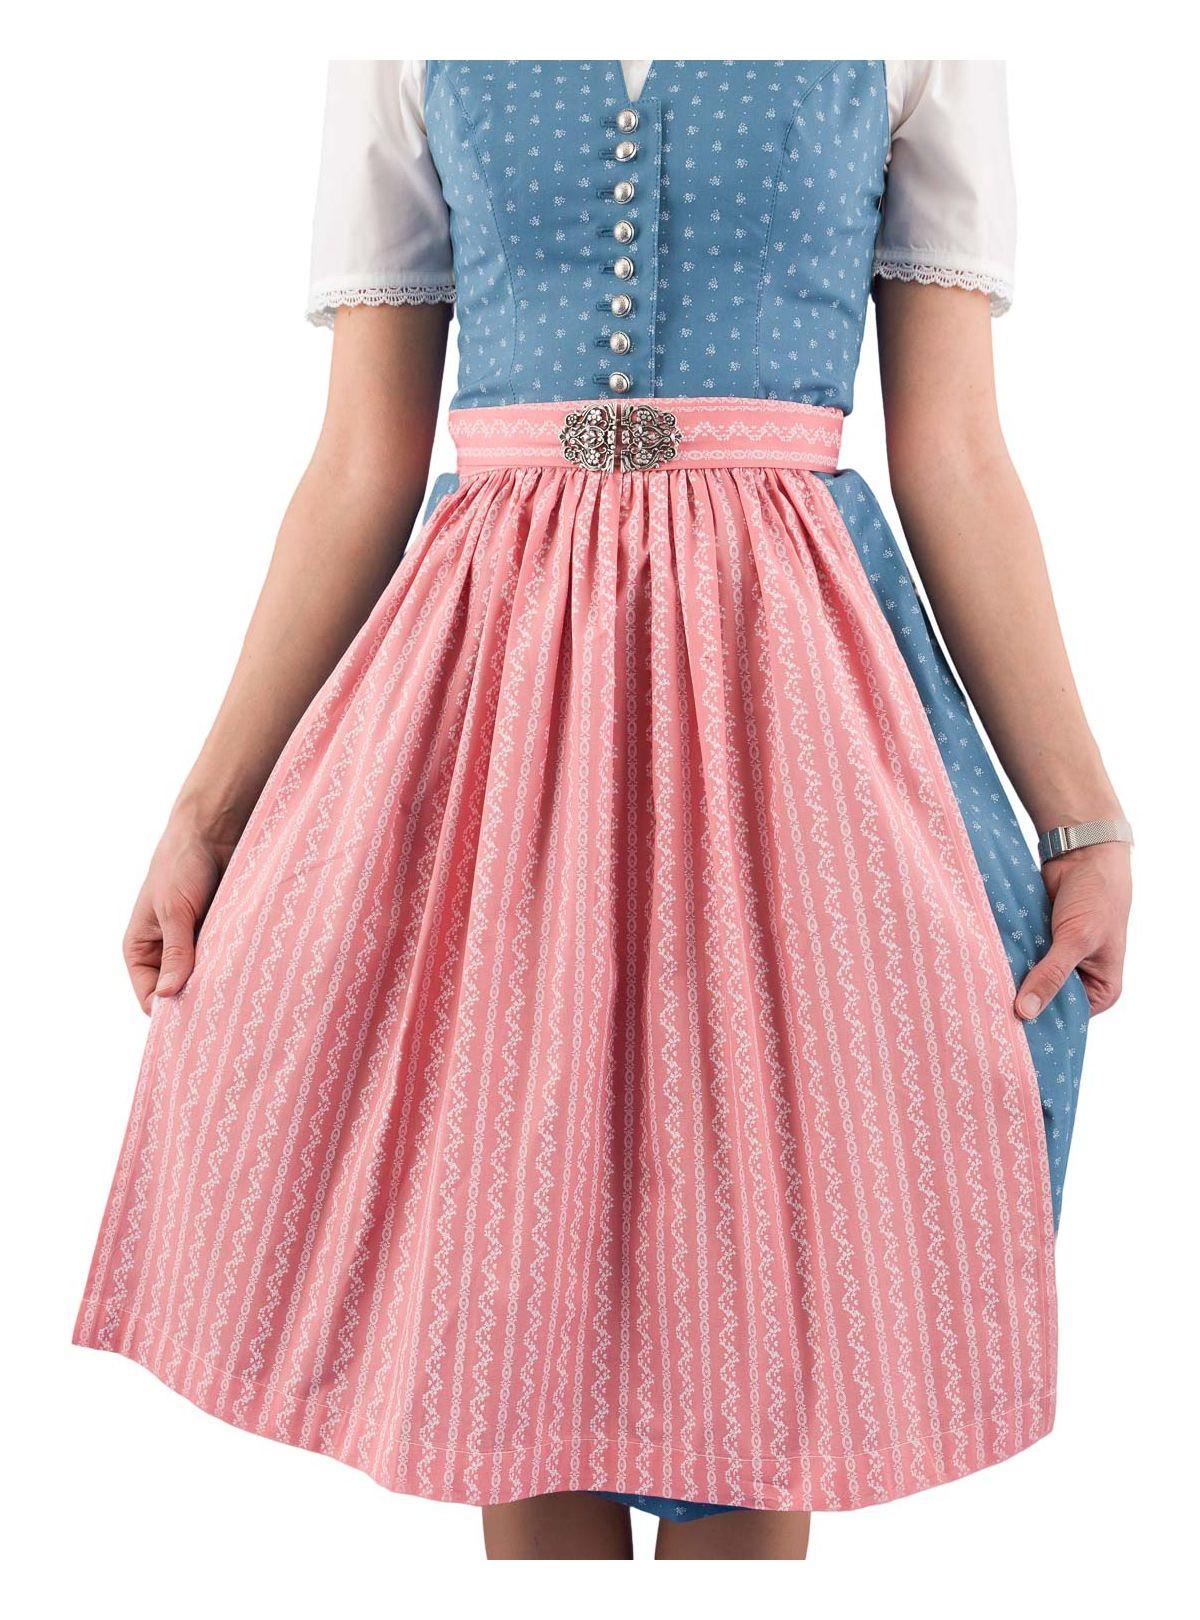 41fbbd546c4d47 Dirndlschürze MarJo 101265-123400 rosa 120 online kaufen | rohn-moden.de